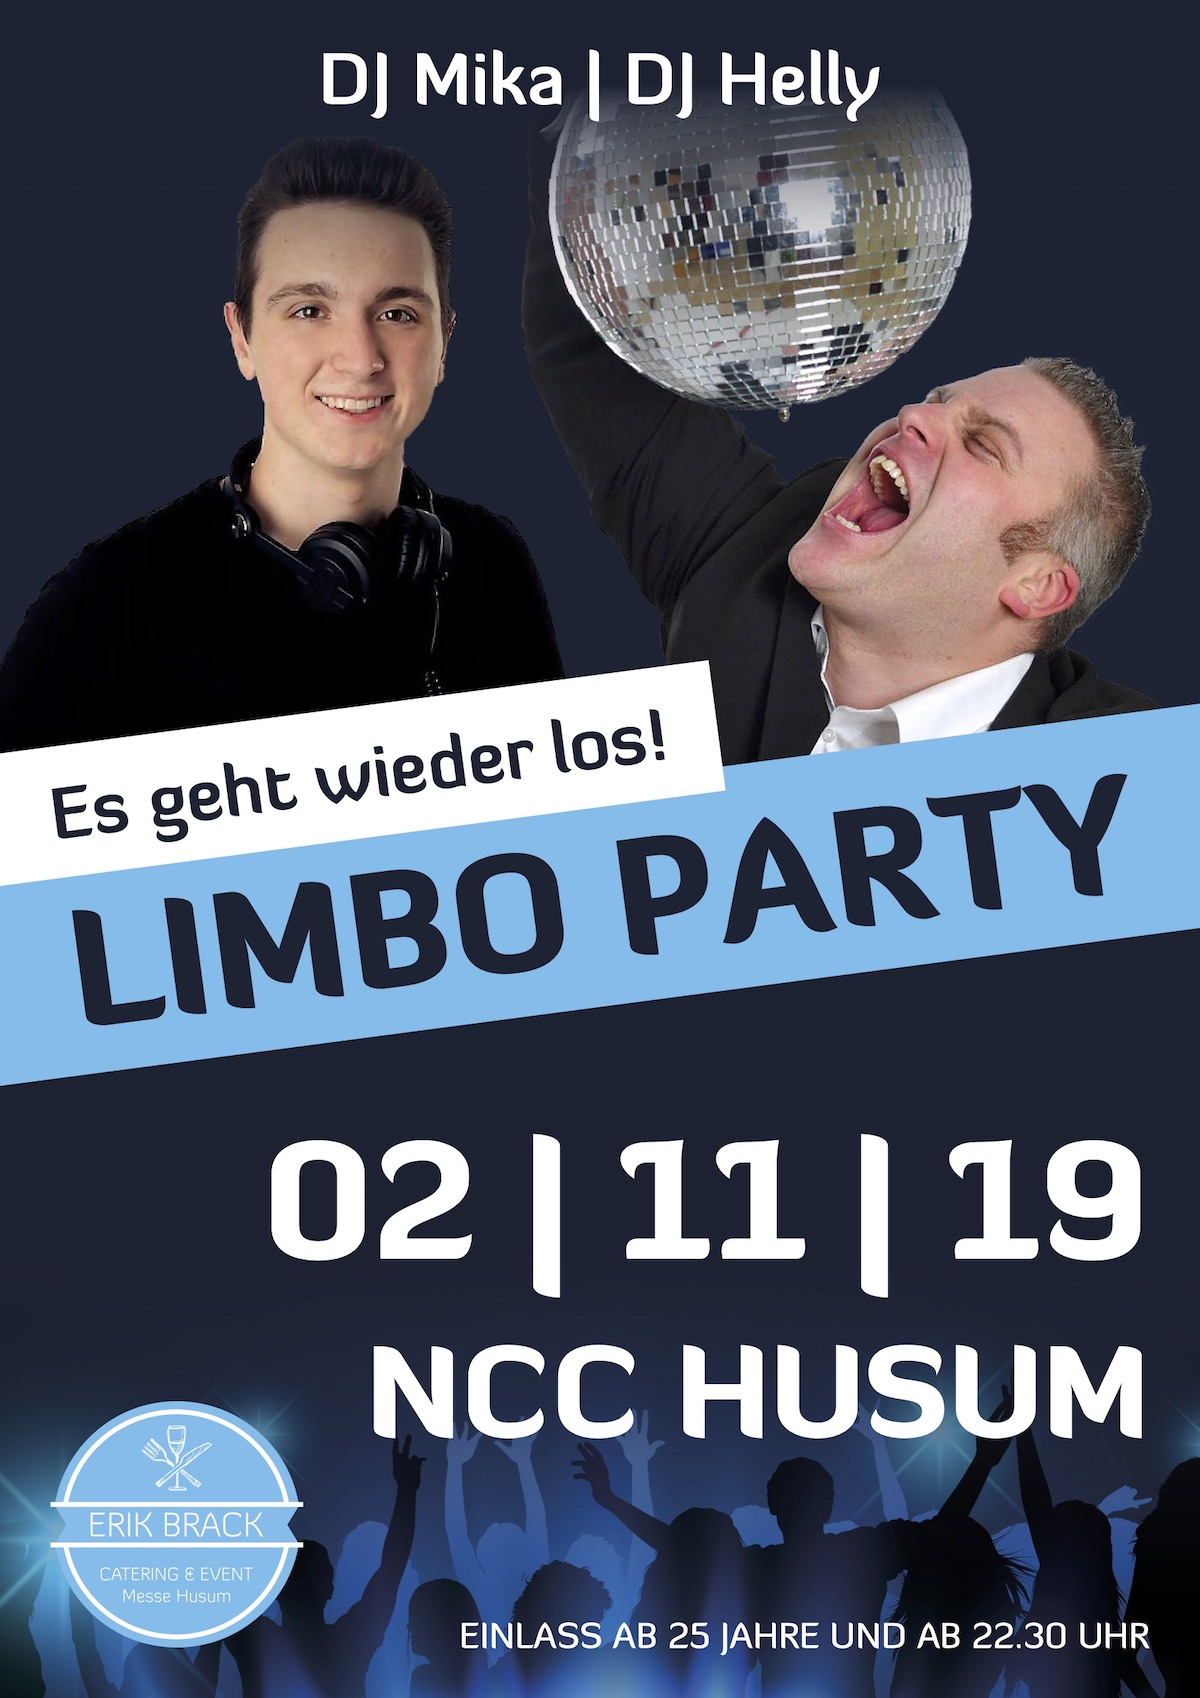 LimboParty 02.11.19 NCC HUSUM